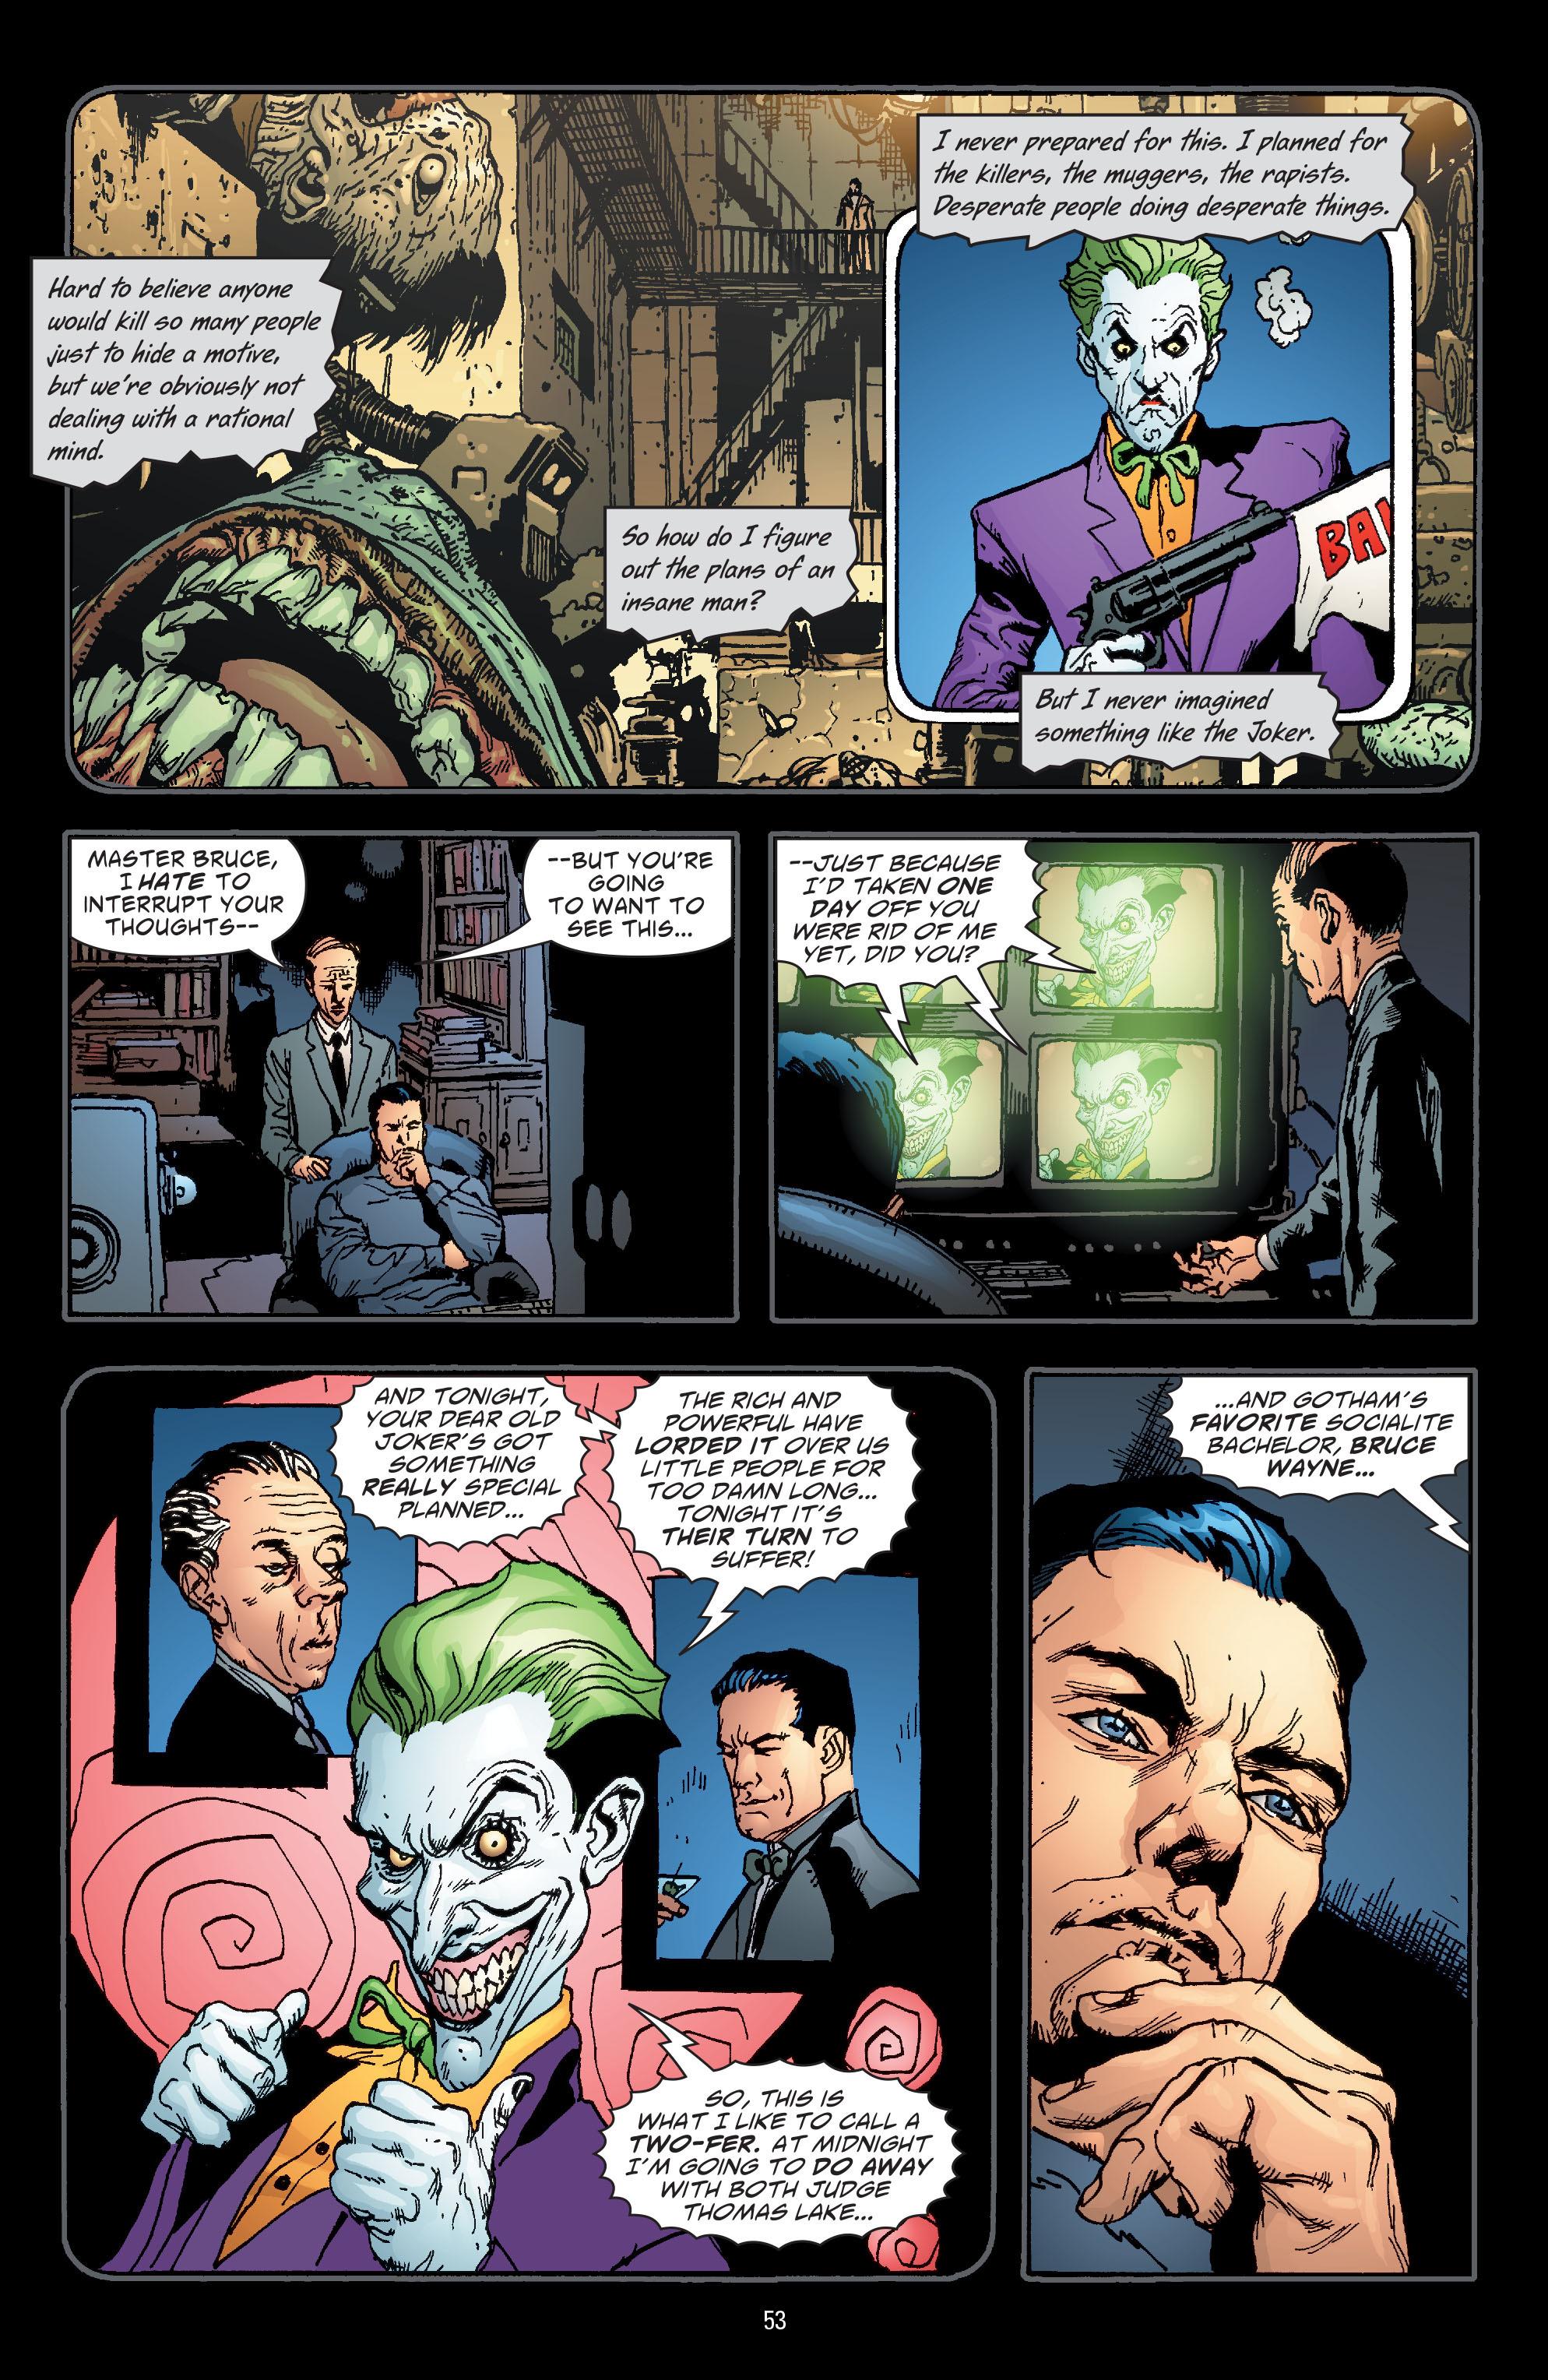 Psychology of Bruce Wayne VB-VcZz2v7X0Sf-UffIAFl-v6TSrWDkgxU2QWQfACh2F2AaHlwuYd6ELzRxbk6Ni1rGIMG7Cu-pb=s0